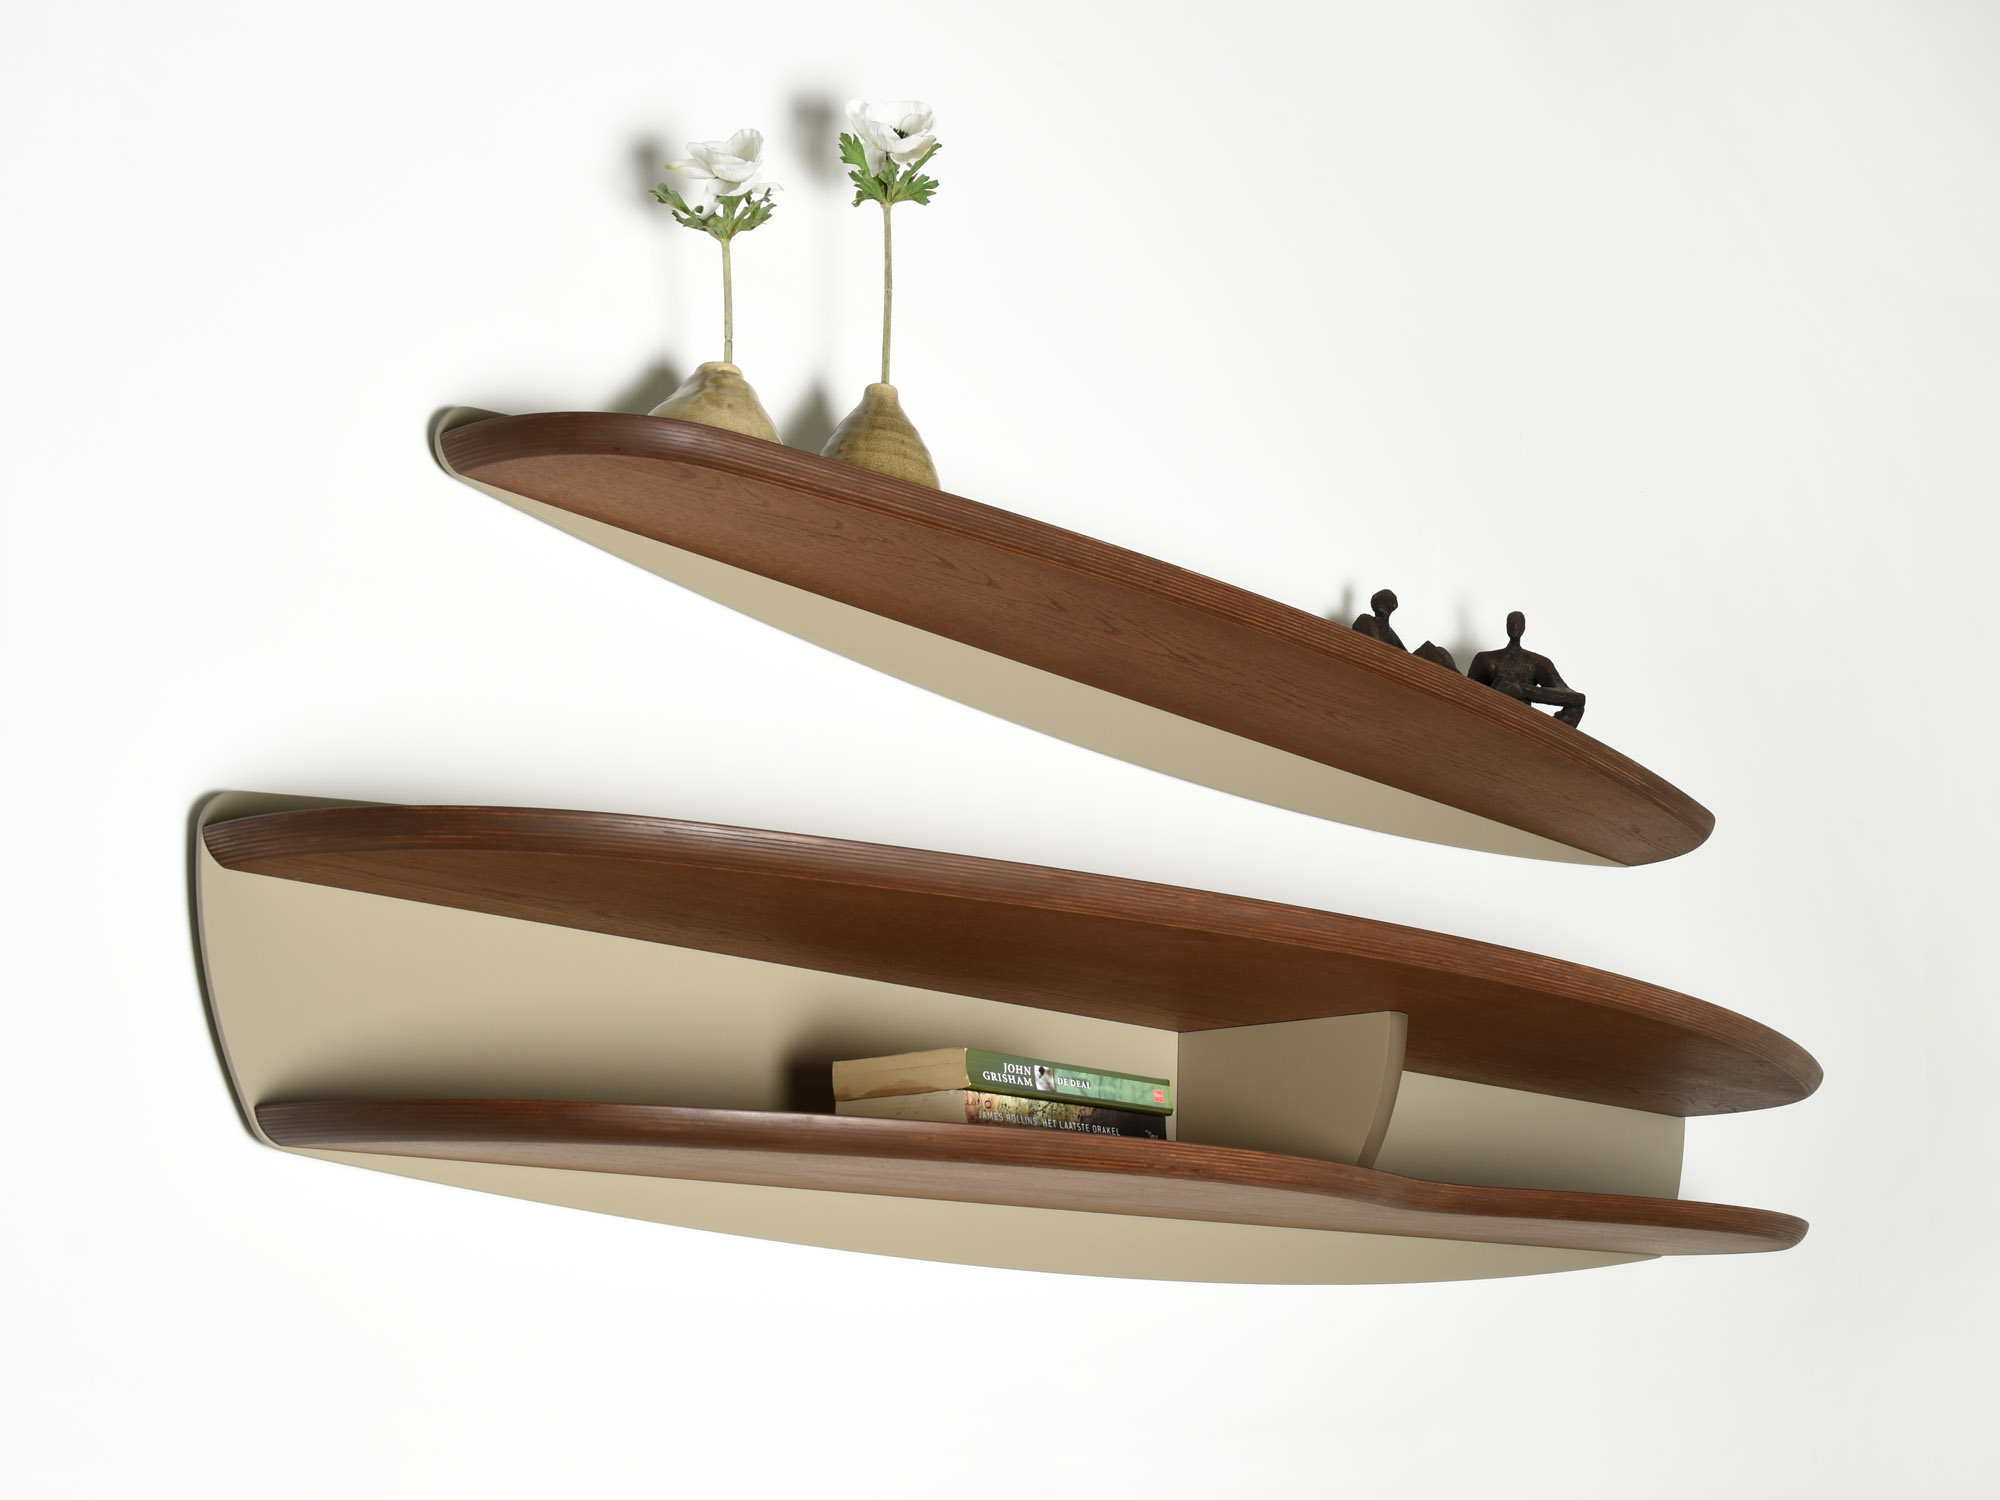 Castelijn CP wandplanken - design by Dick Spierenburg